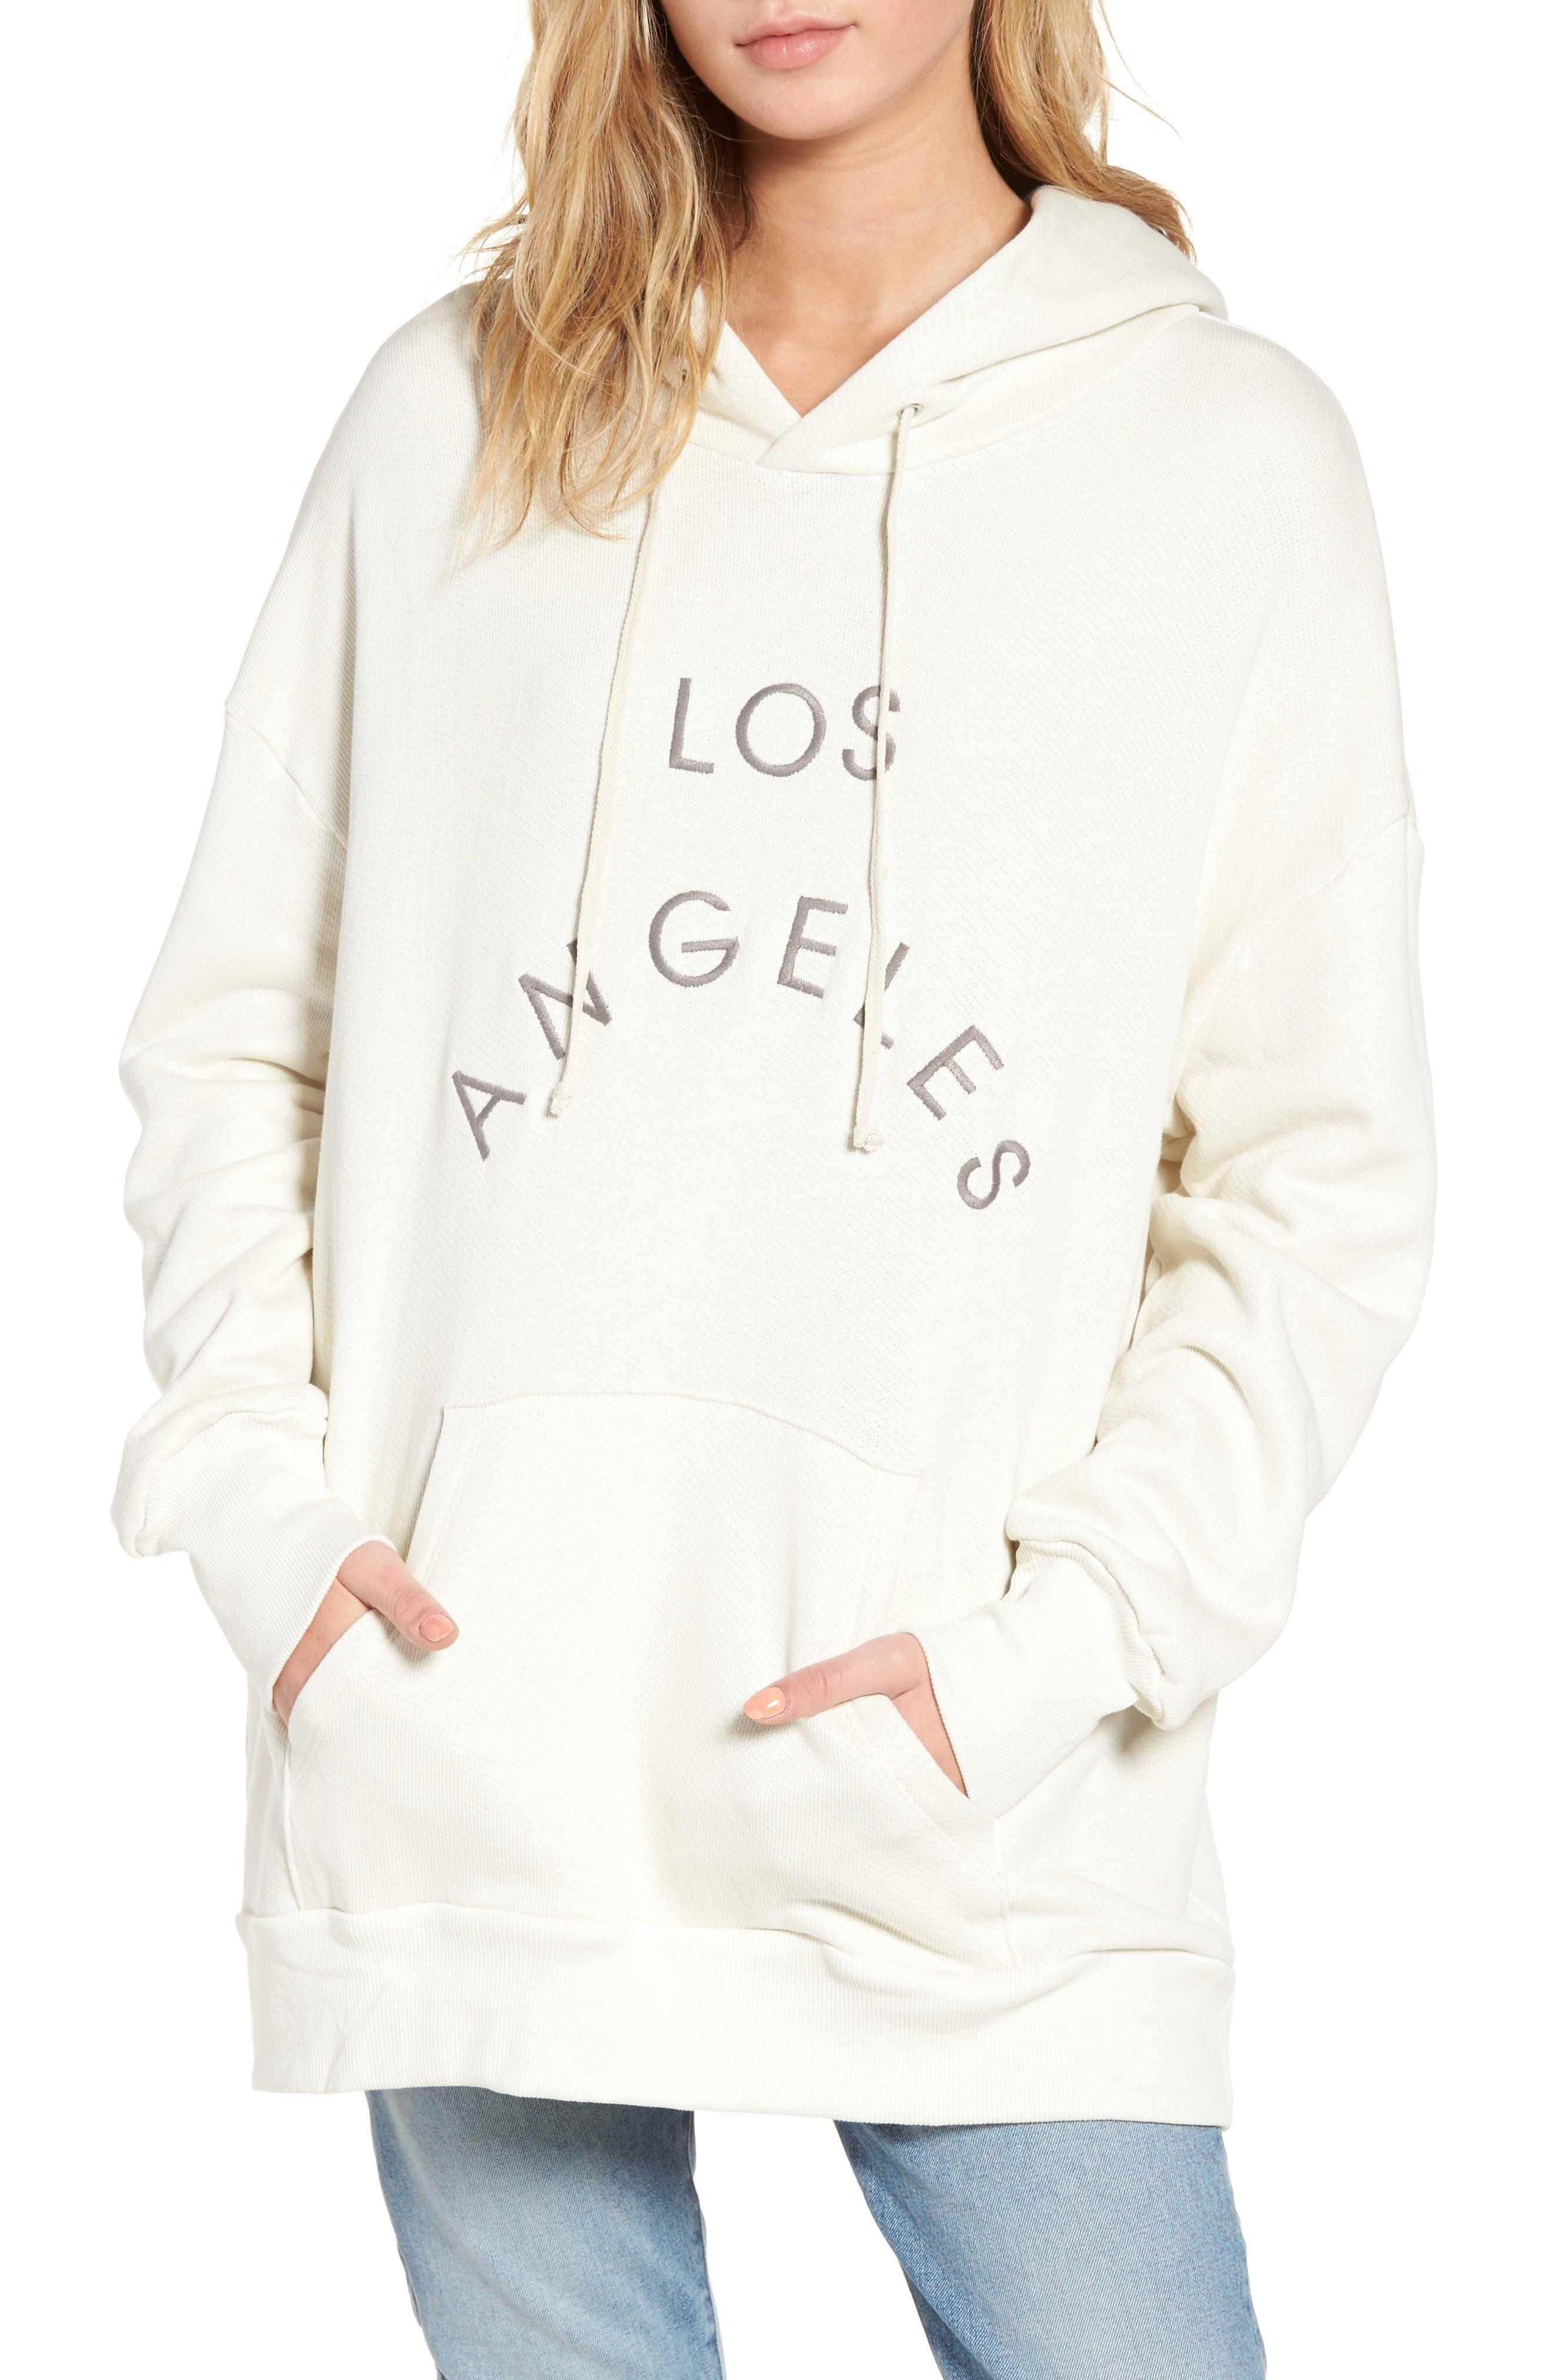 Alternate Image 1 Selected - Wildfox Los Angeles Oversize Hoodie